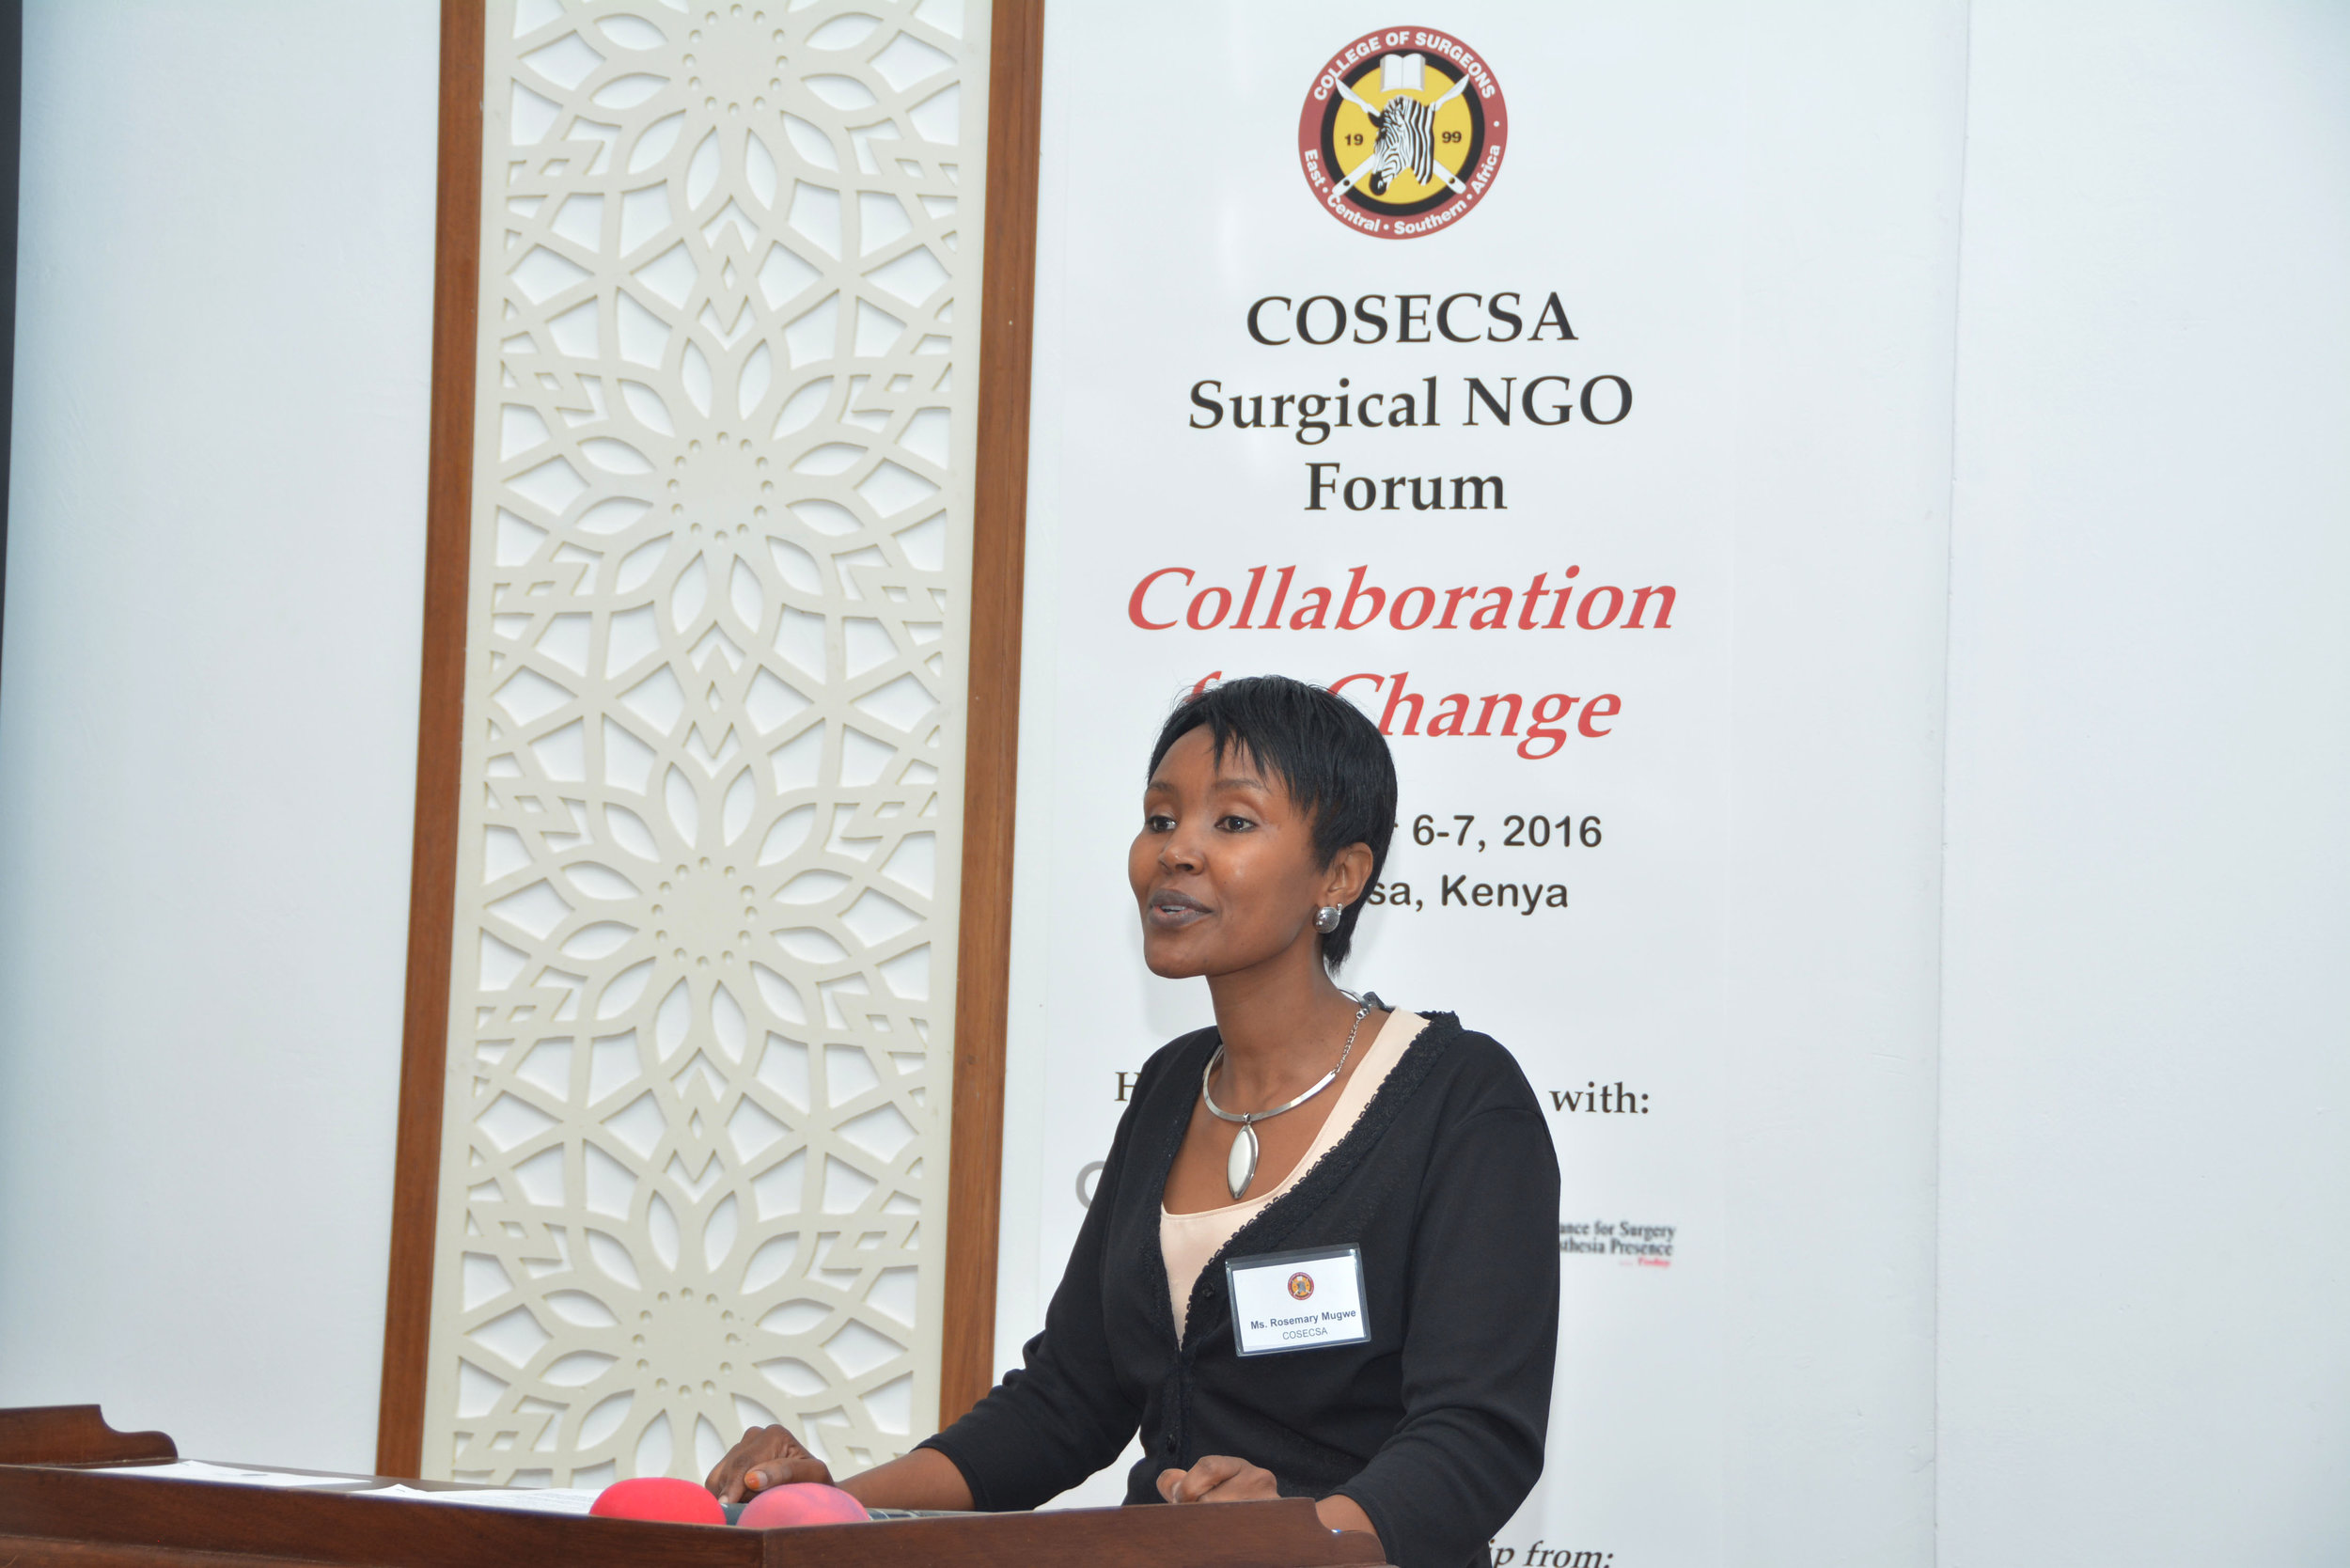 COSECSA Surgical NGO Forum - Ms. Rosemary Mugwe - CEO, COSECSA (1).JPG